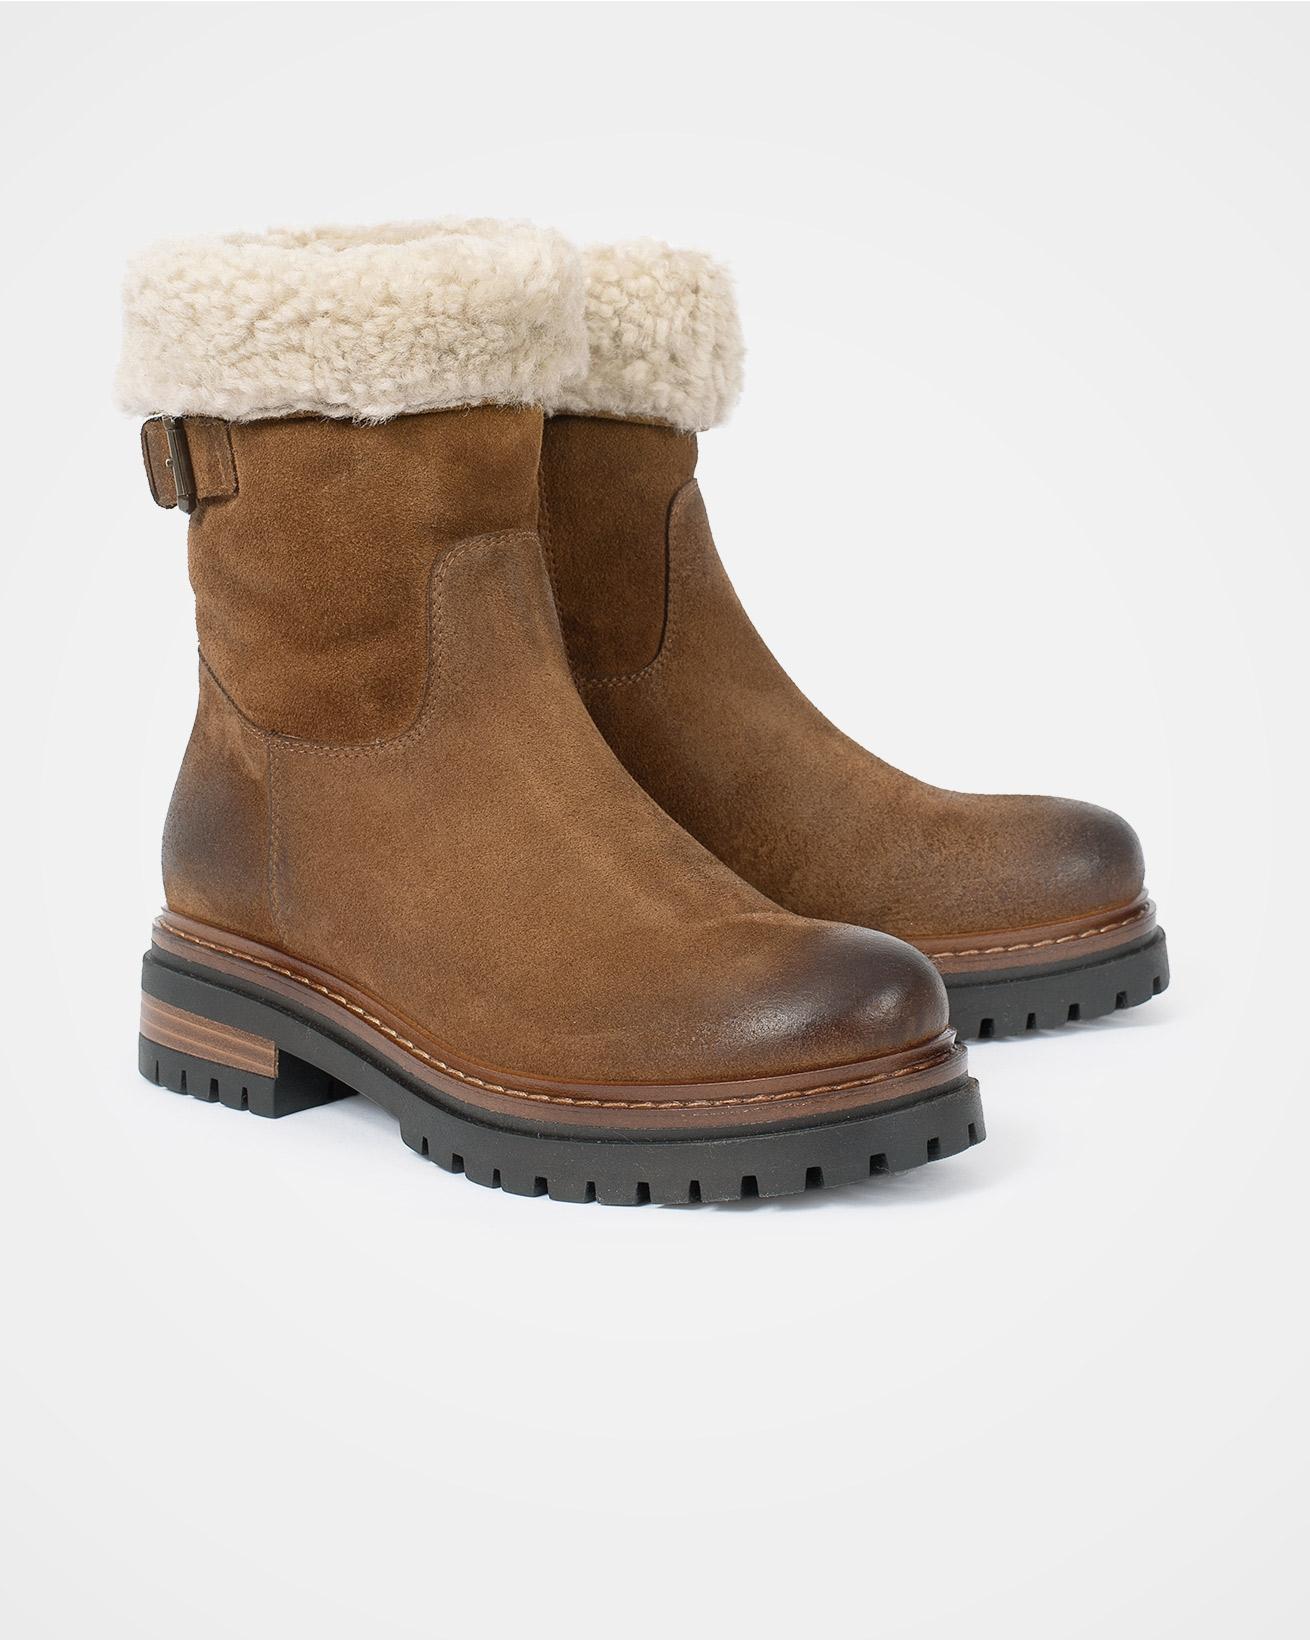 Sheepskin Cuff Ankle Boot - Autumn Brown - Size 37 - 2572